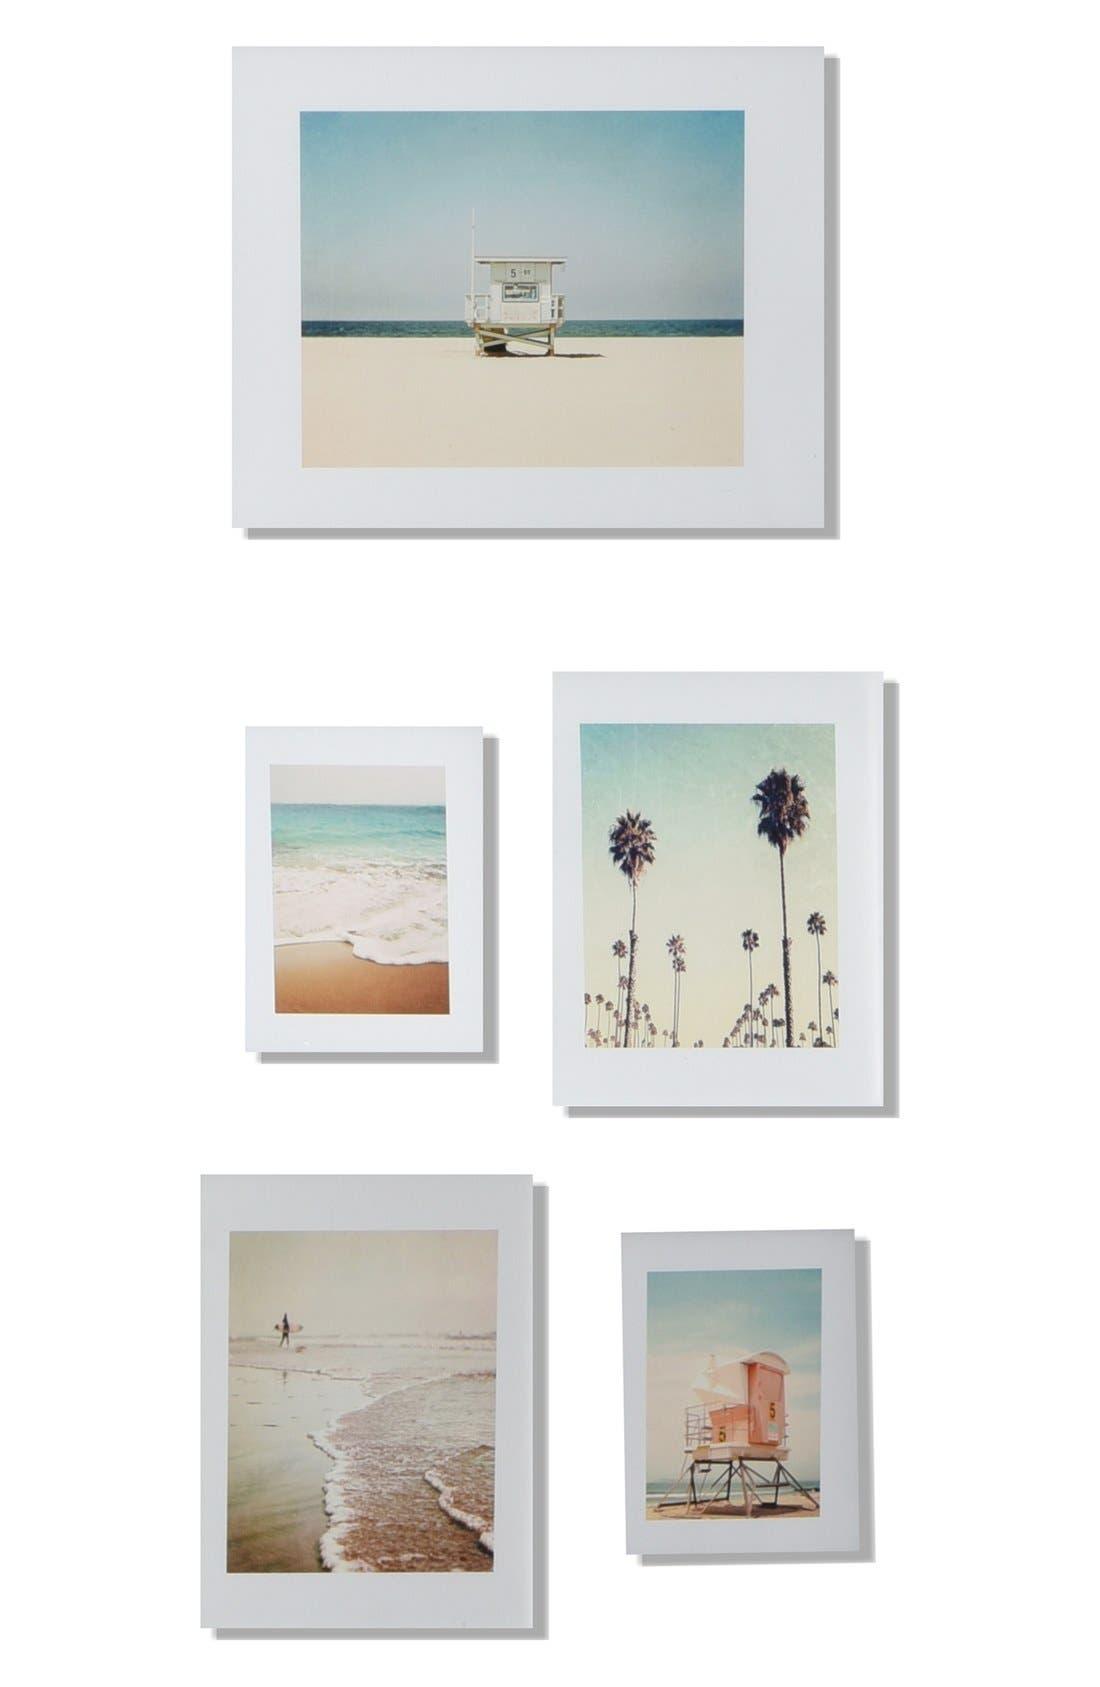 Main Image - Deny Designs '5th Street' Wall Art Print Set (Set of 5)